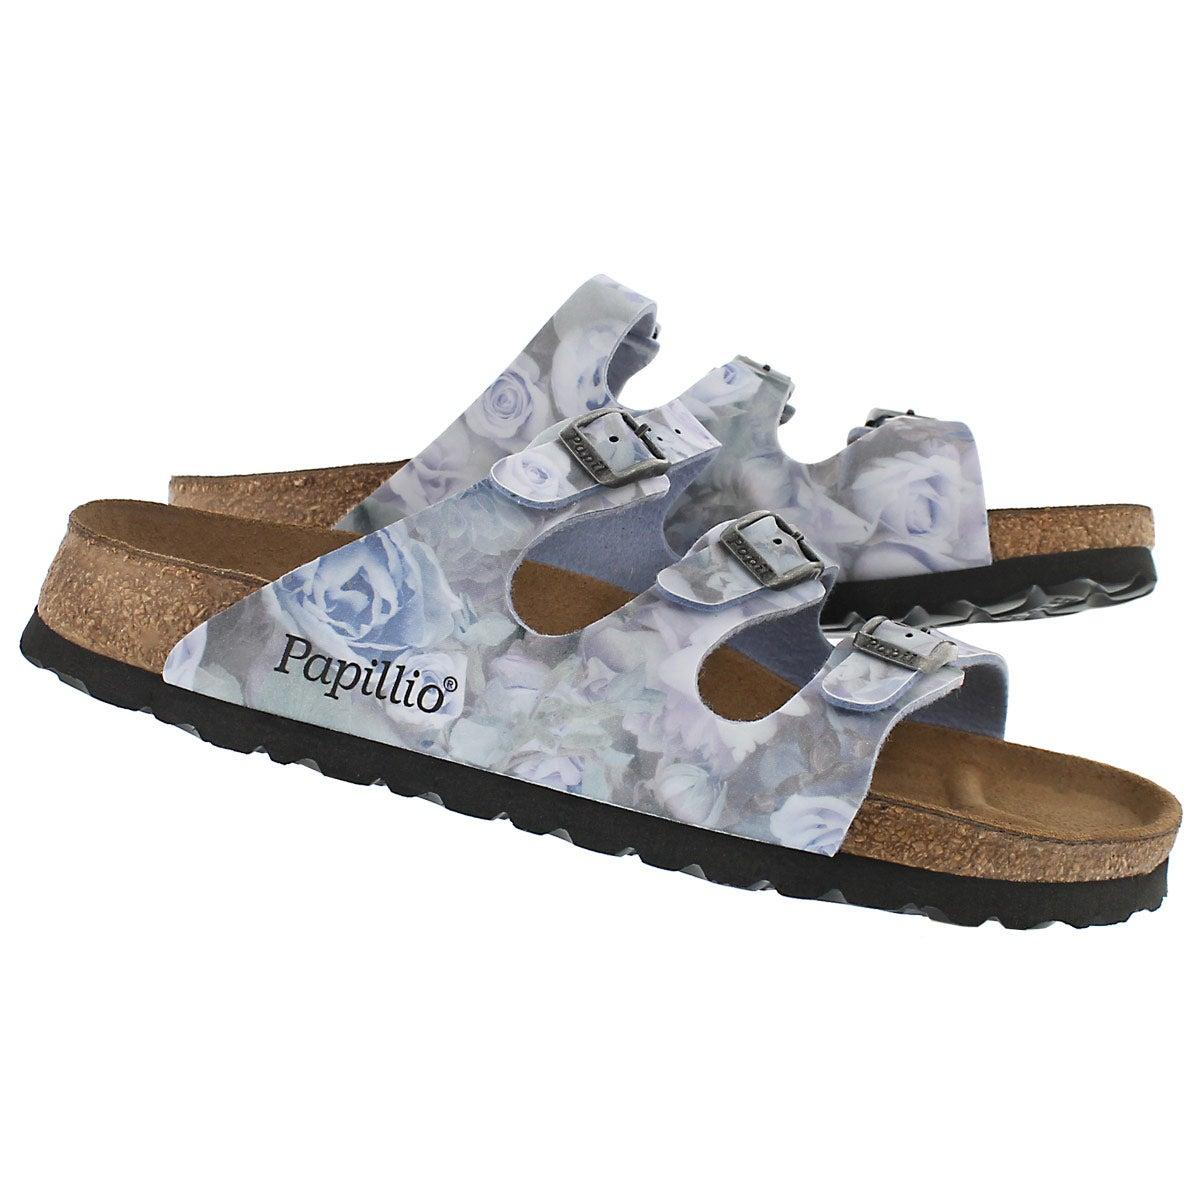 Lds Florida silky rose blue sandal-Narro